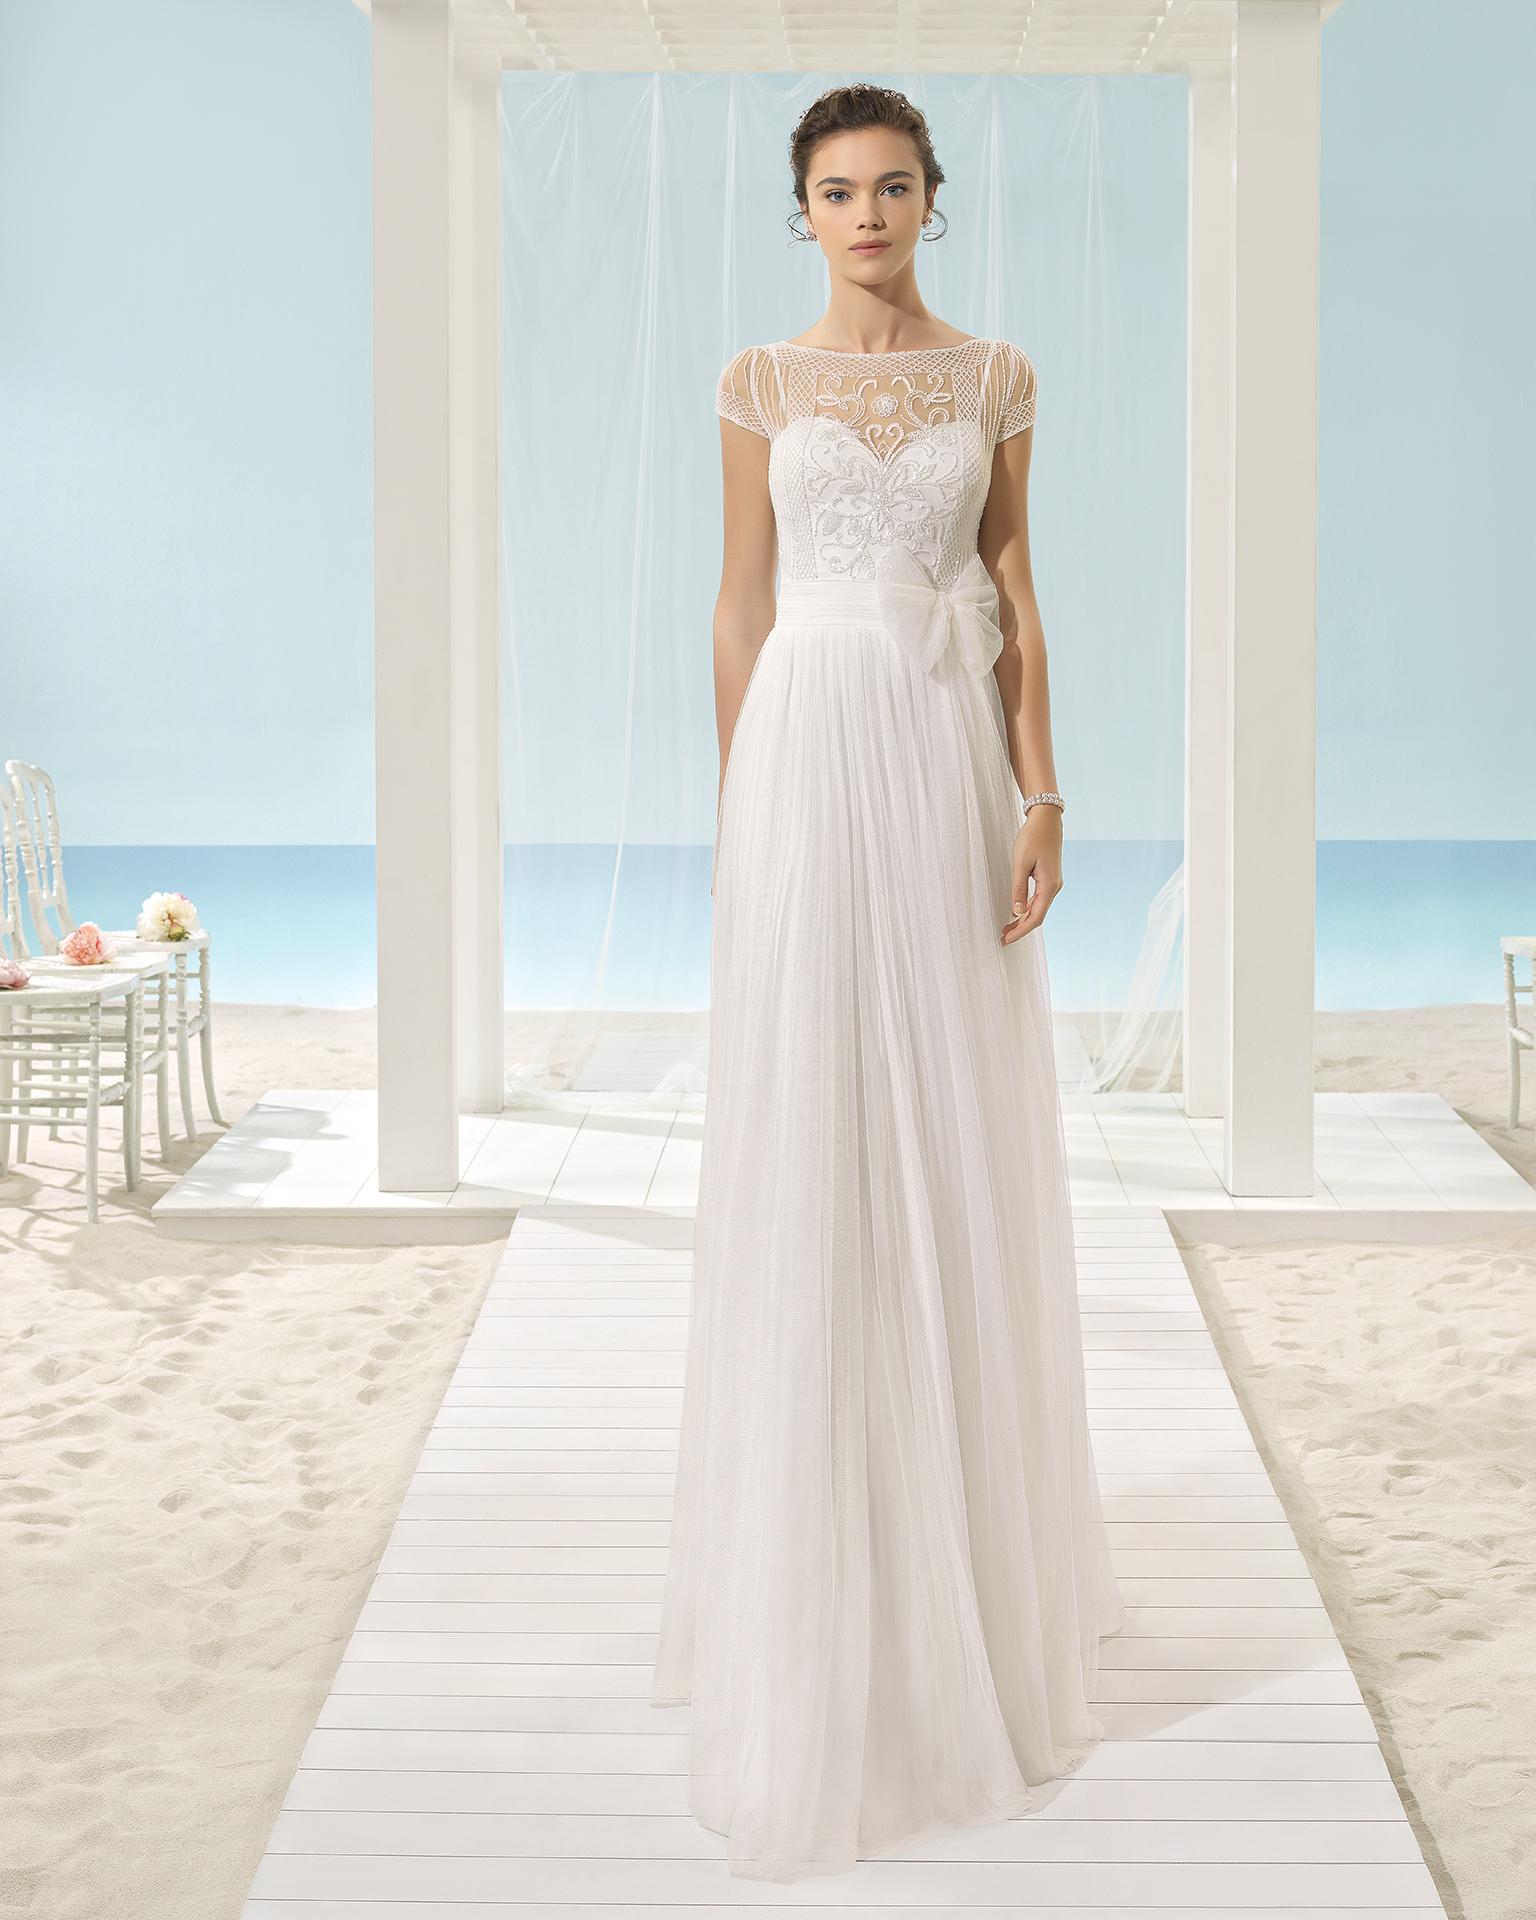 XENOP vestido de noiva Aire Barcelona Beach Wedding 2017